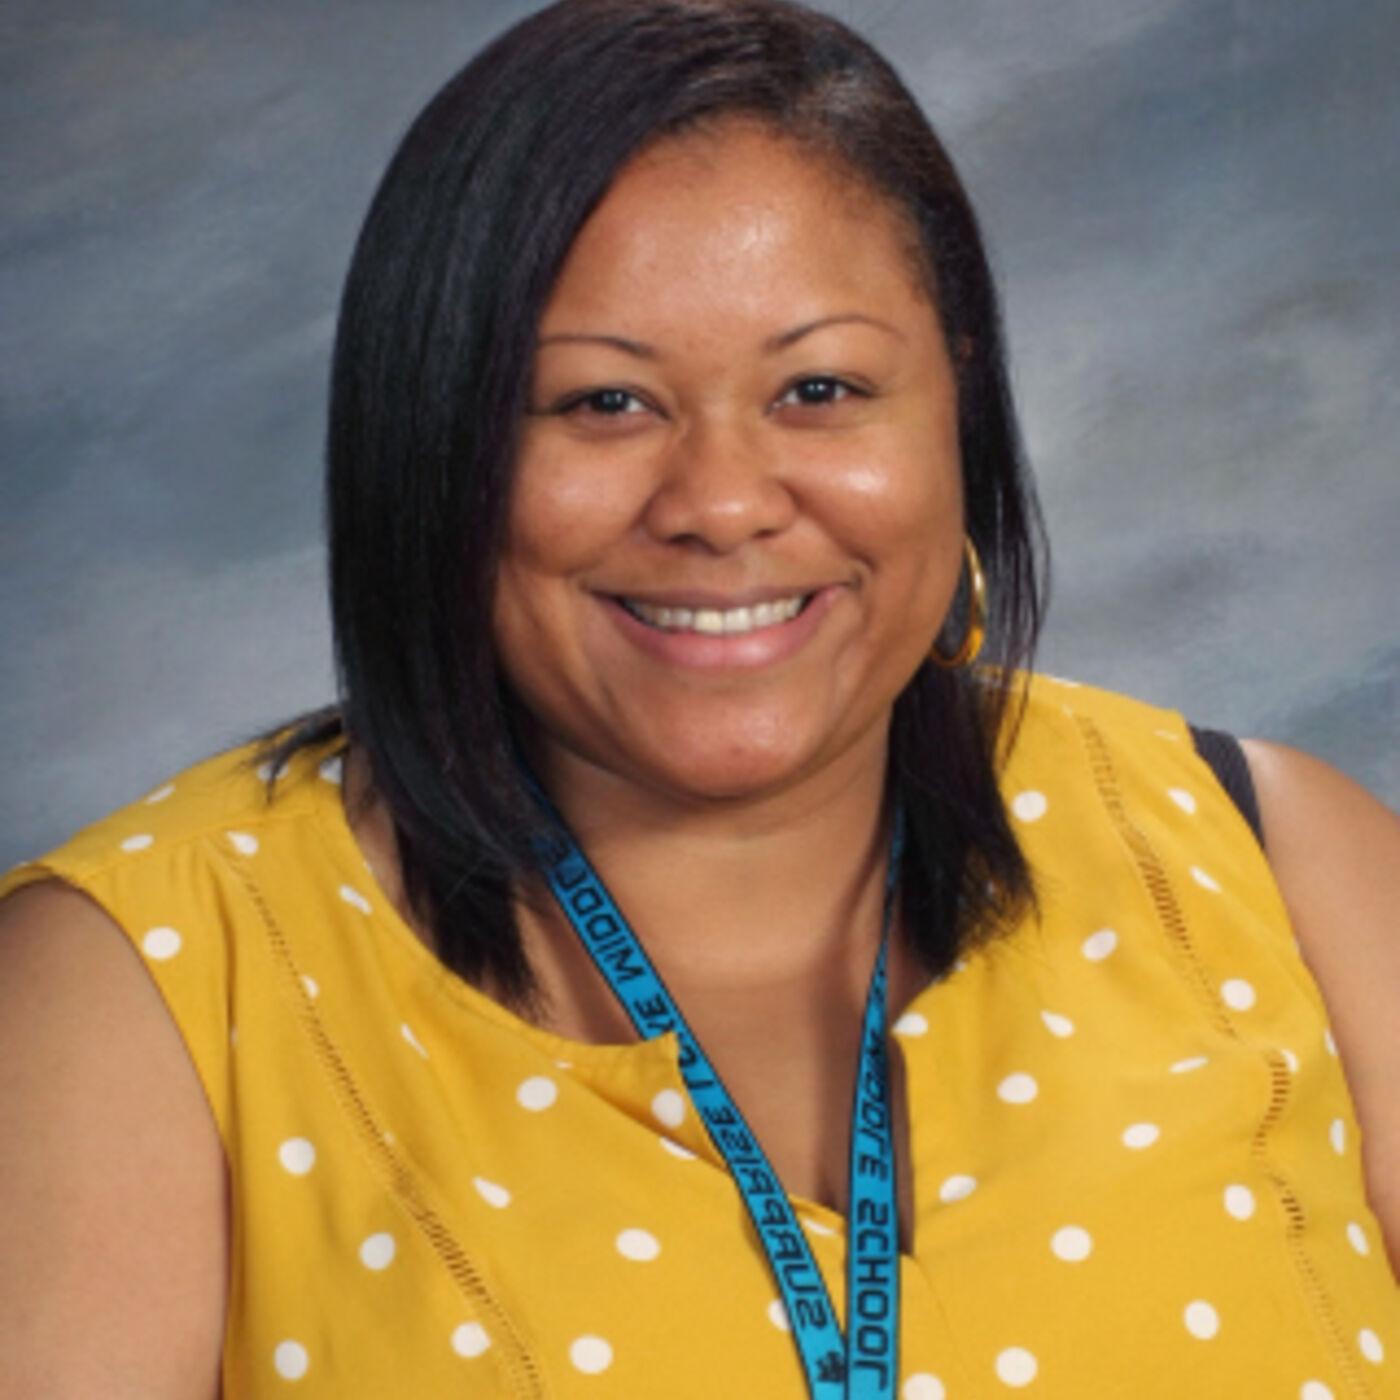 Ms. Johnson